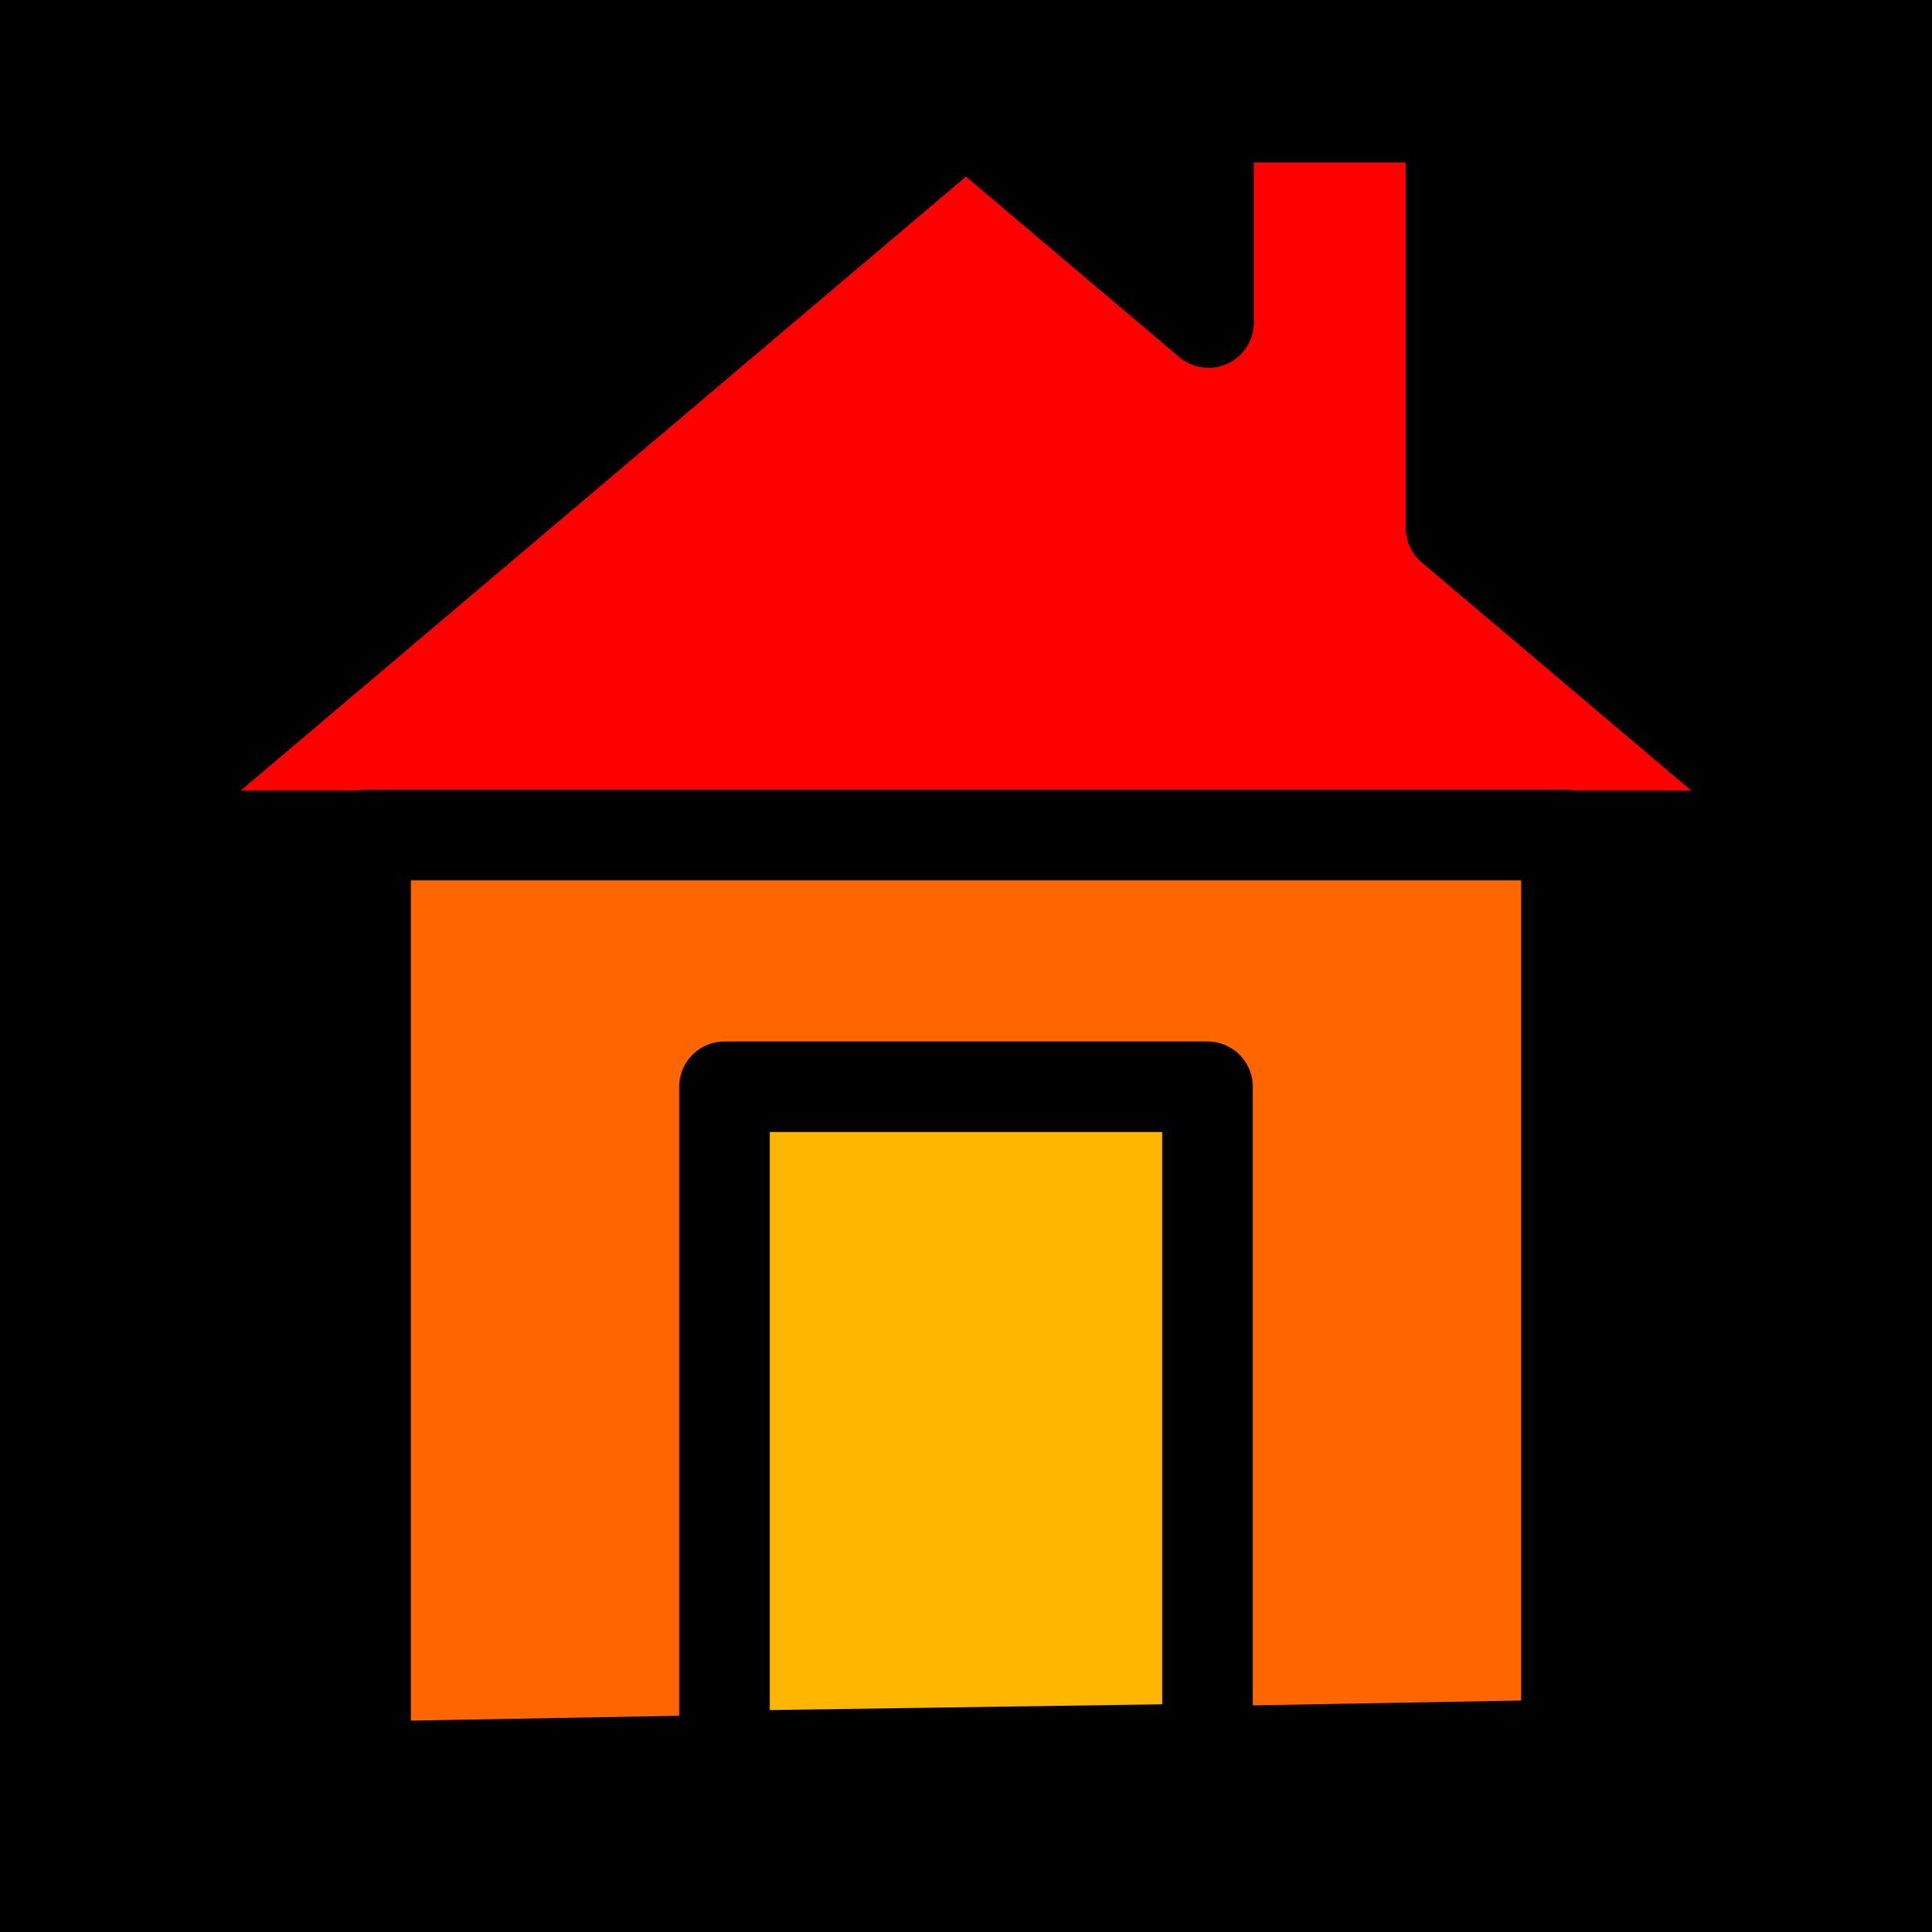 House clipart orange. Home icon big image